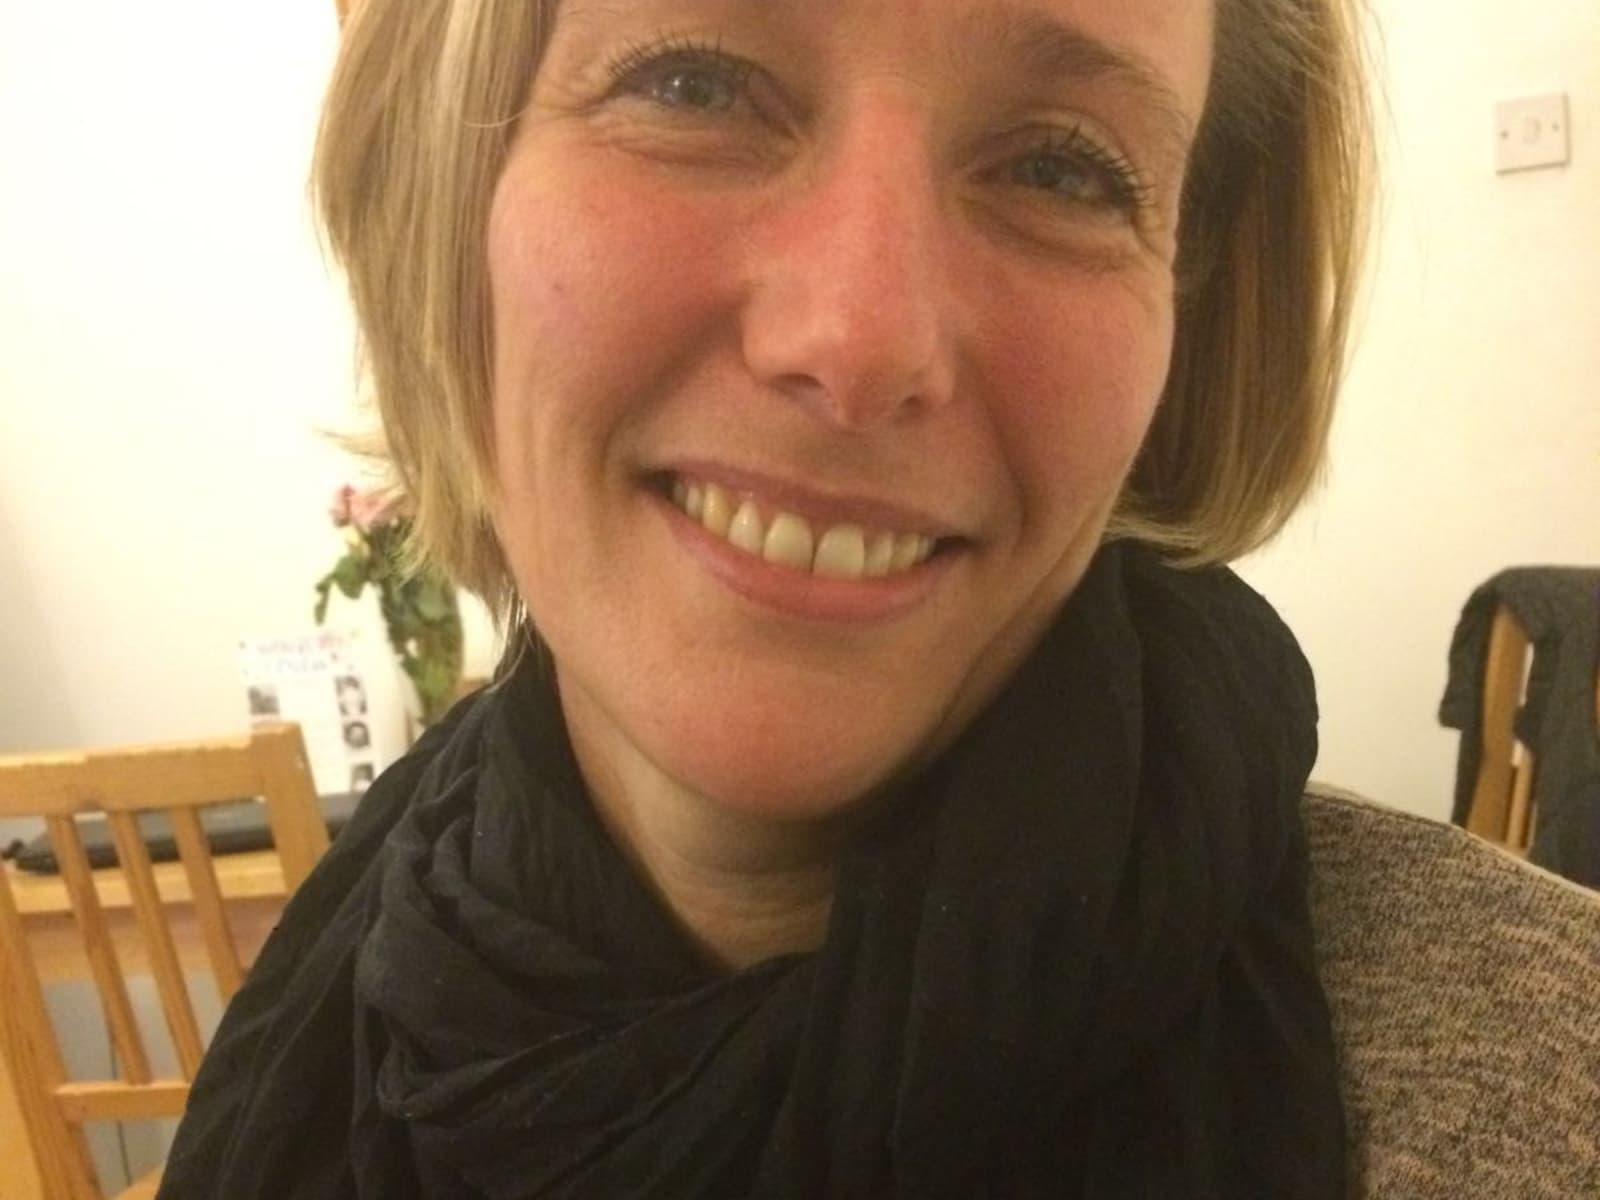 Christine from London, United Kingdom